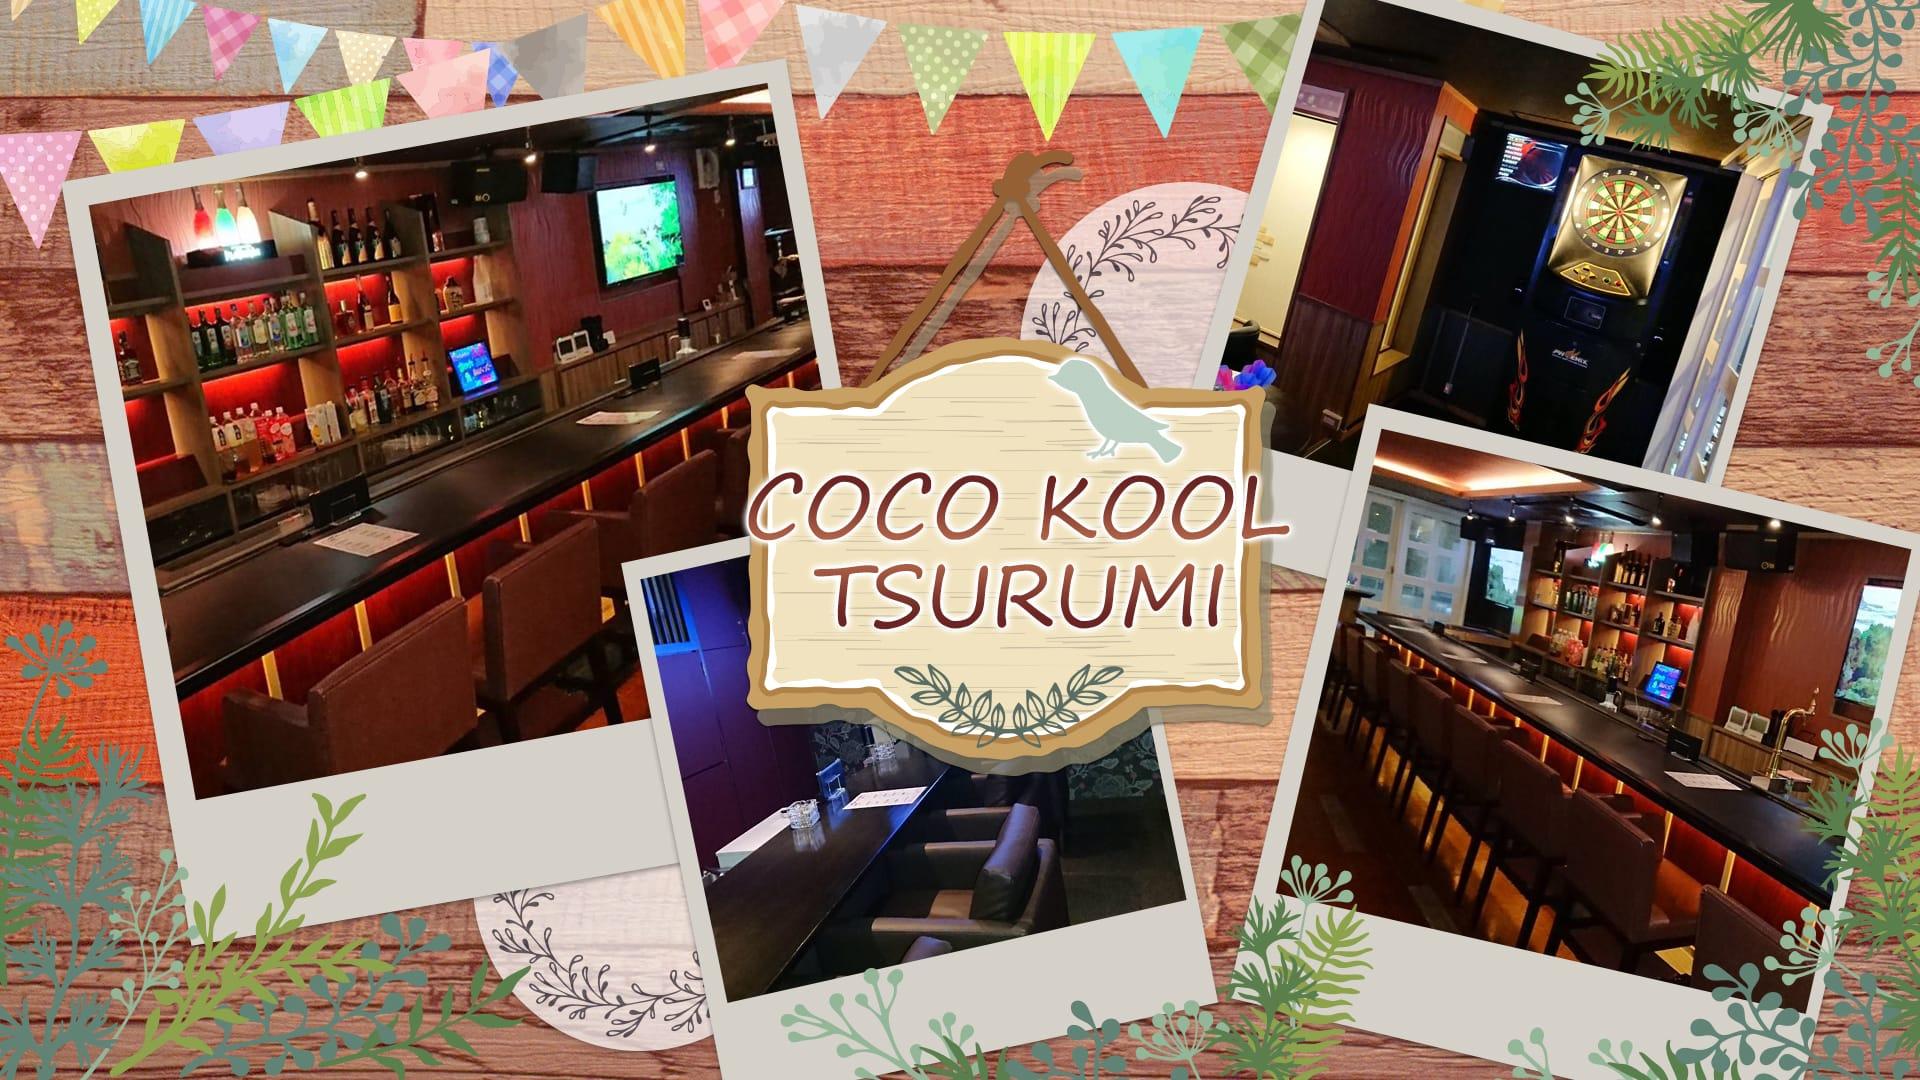 COCO KOOL TSURUMI(ココクール) 鶴見ガールズバー TOP画像